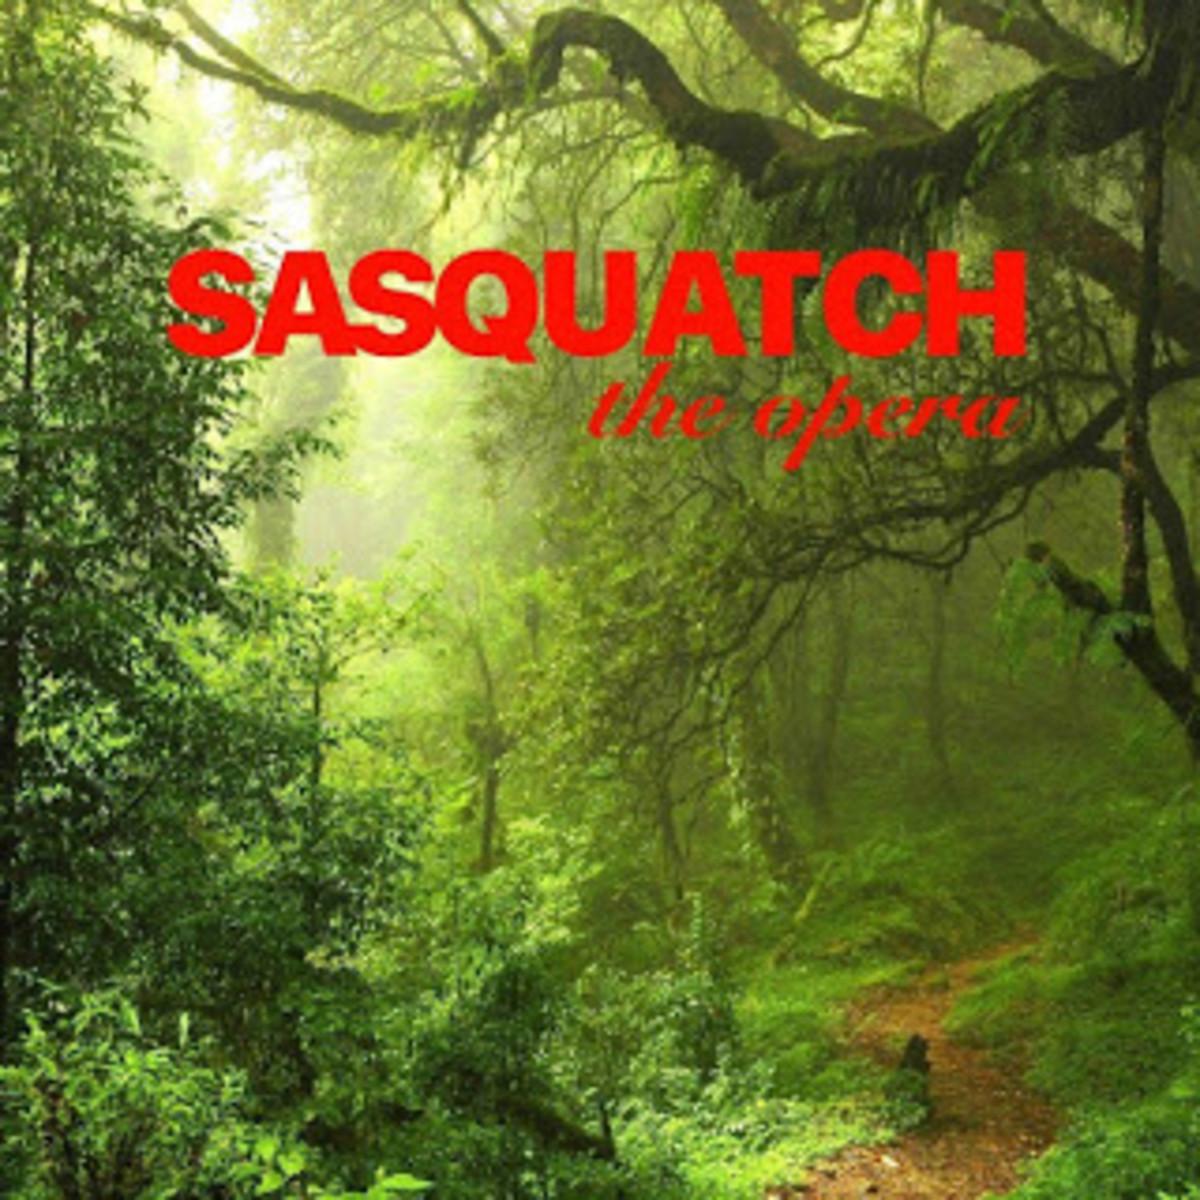 Promo flyer for Sasquatch: The Opera